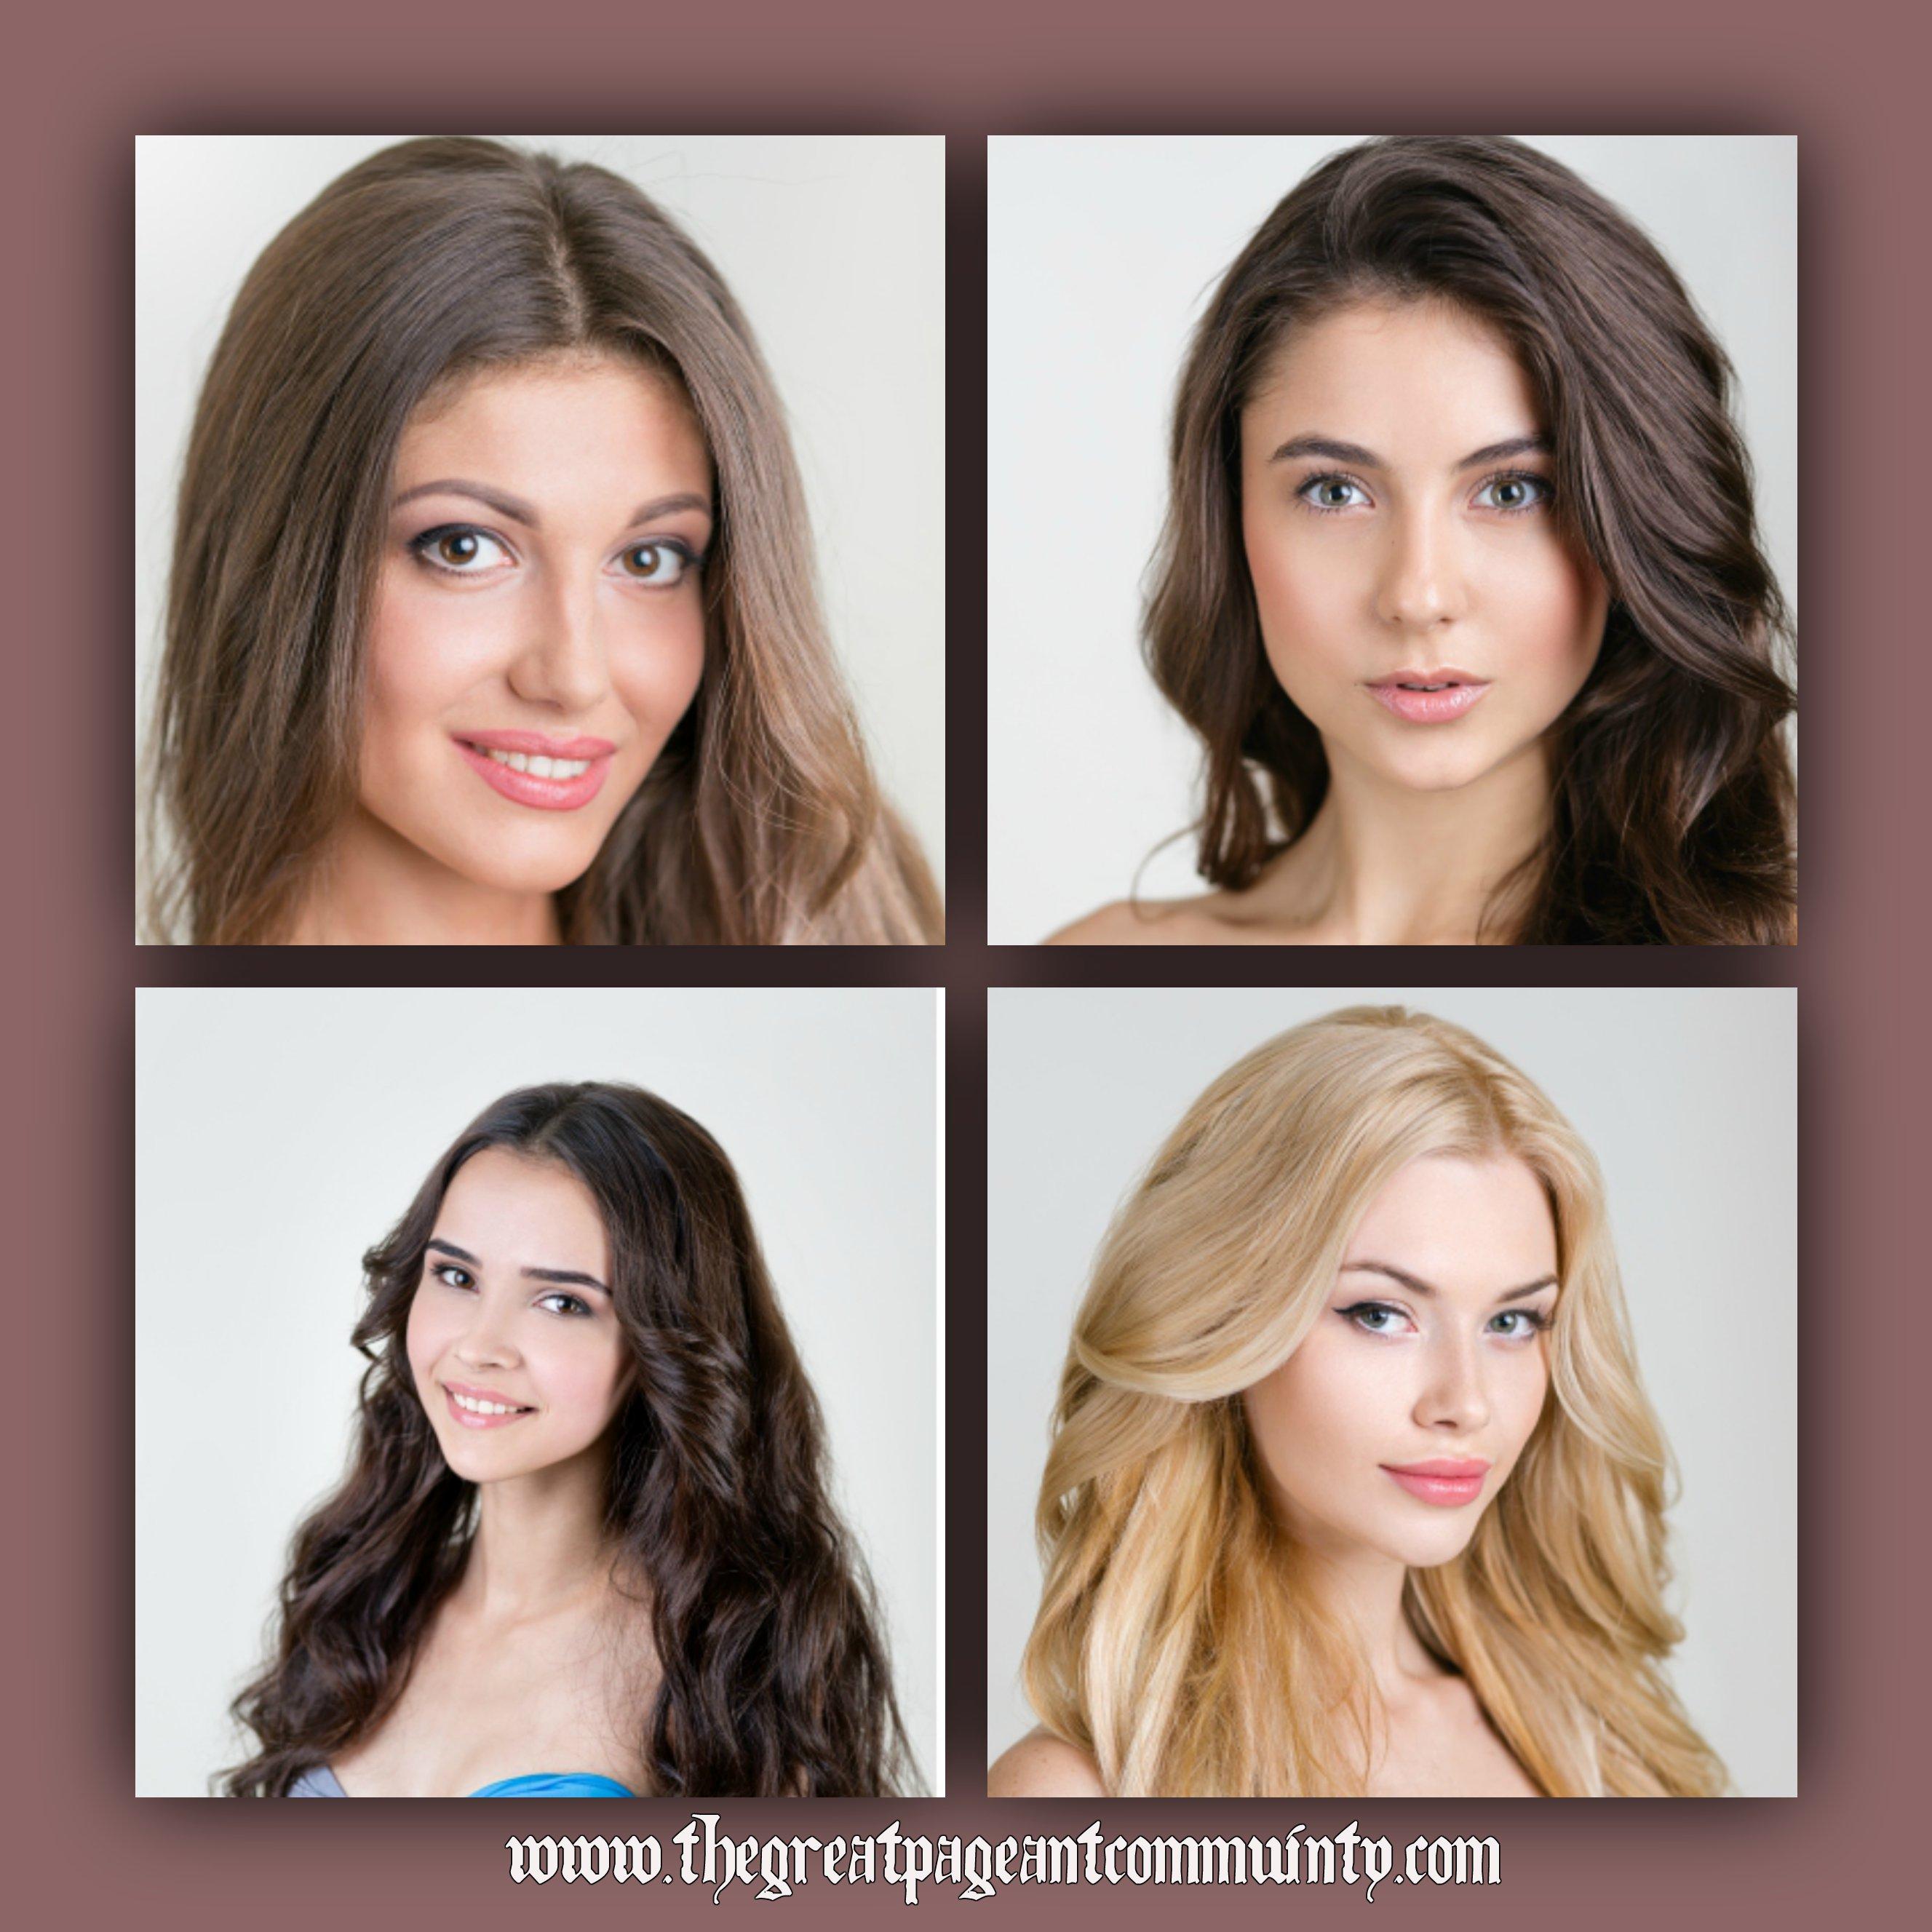 Miss Ukraine 2015 Contestants [Individual Photos] – The Great